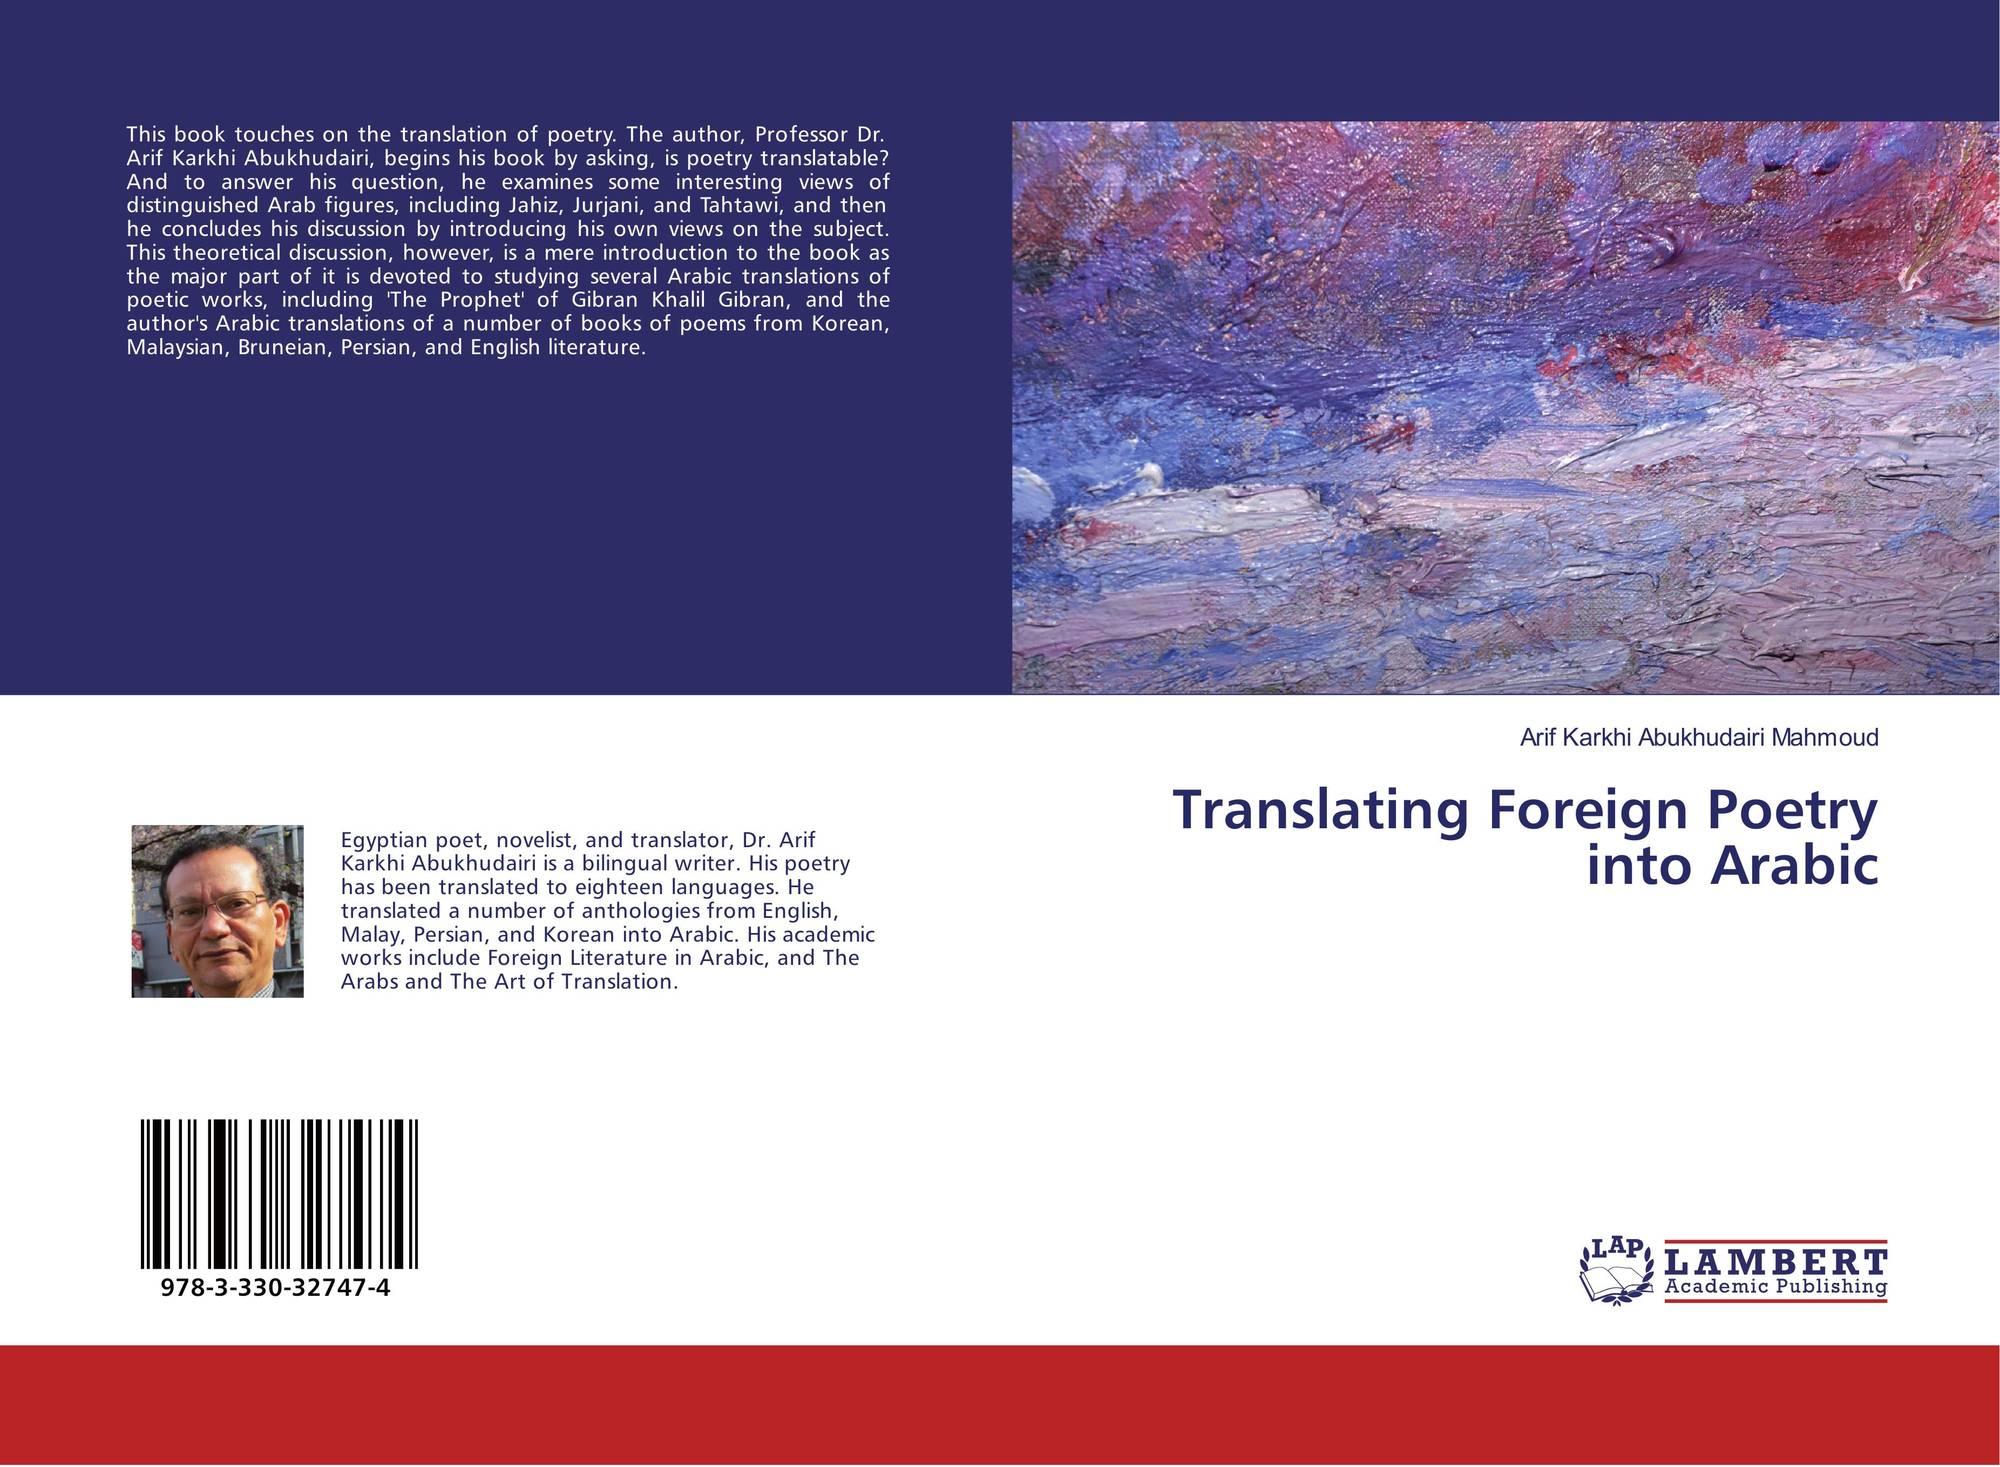 translation into arabic